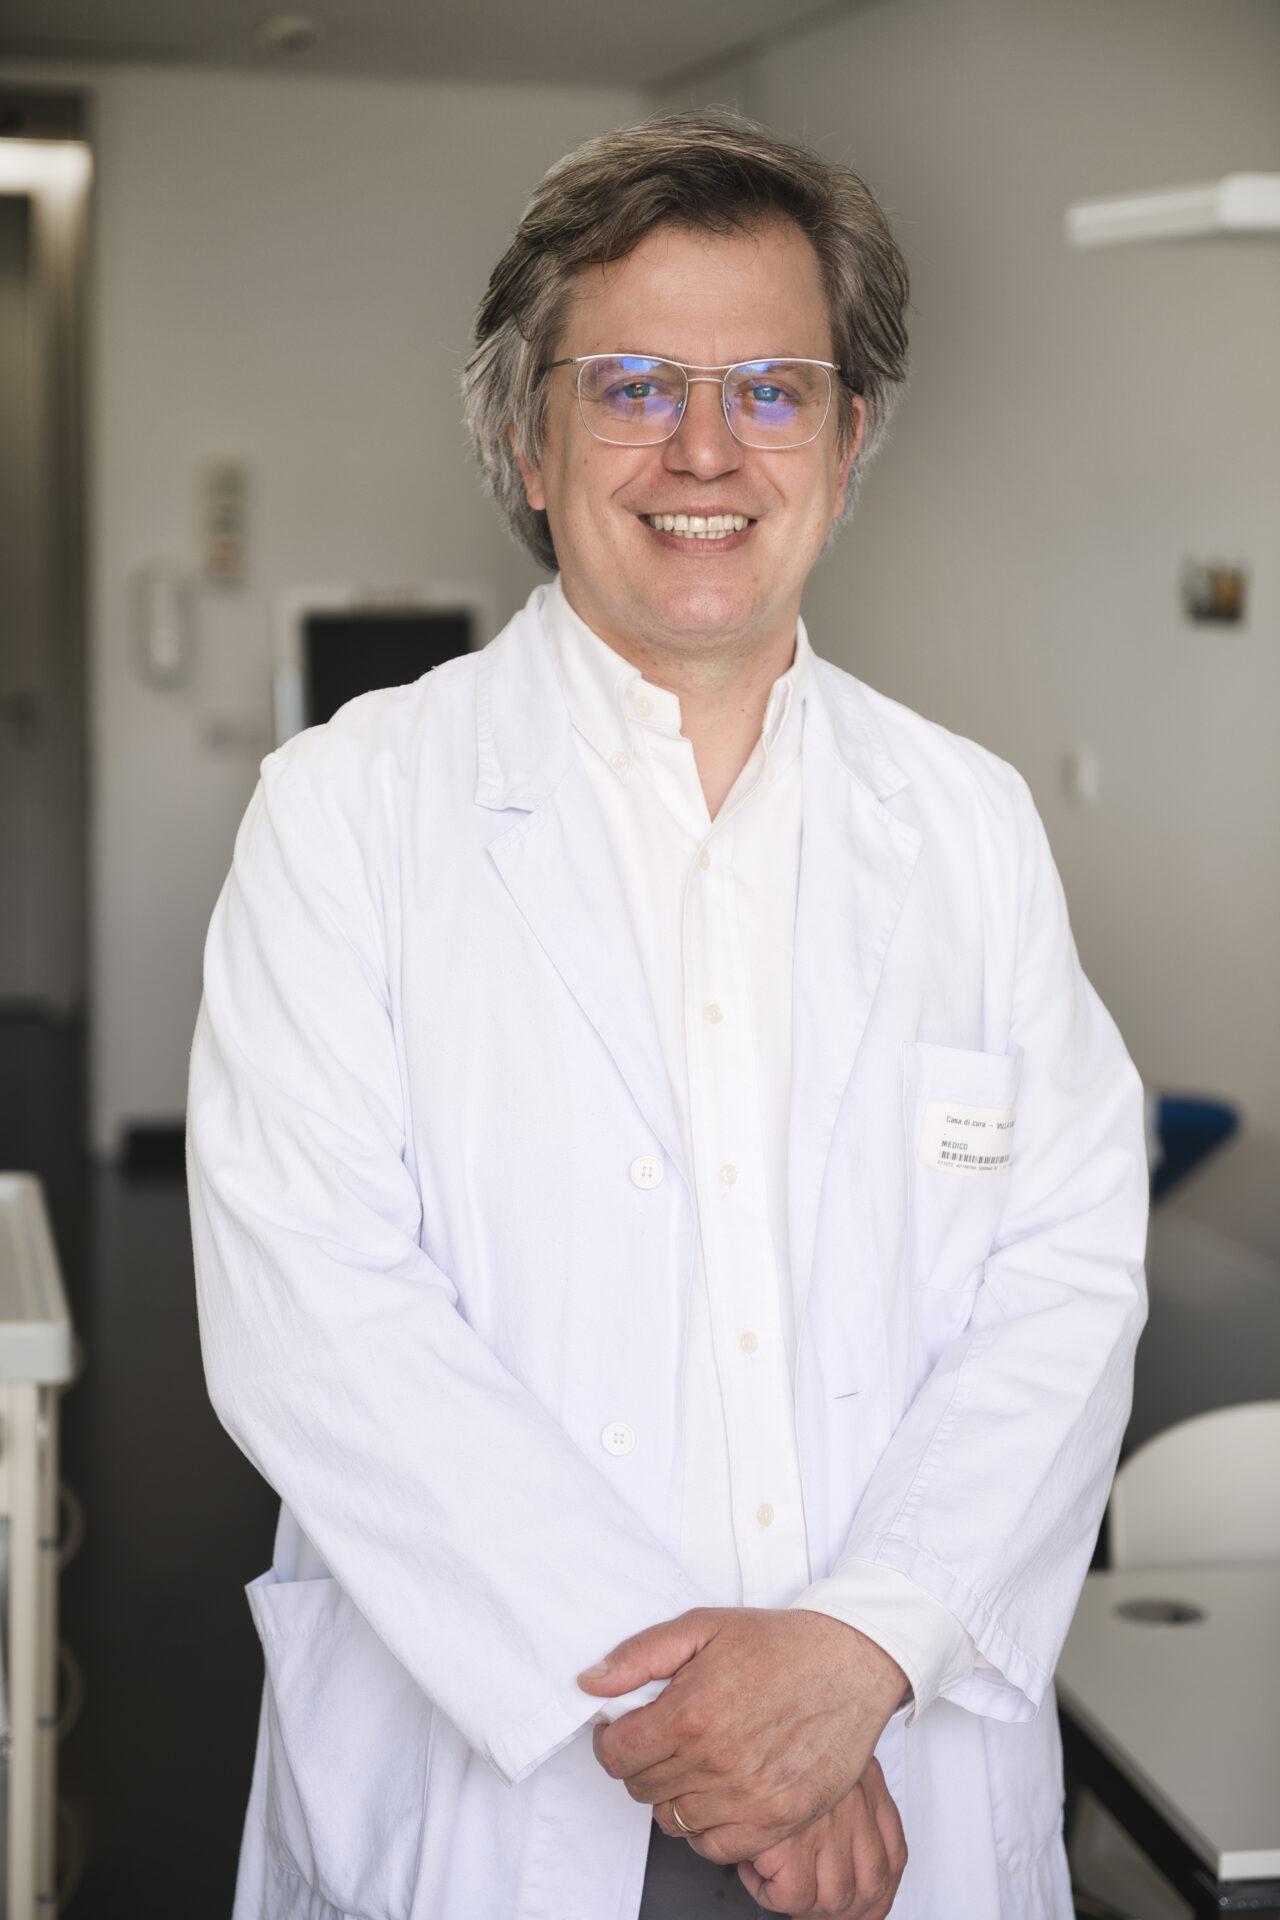 Dottor Sacchi specialista in medicina rigenerativa